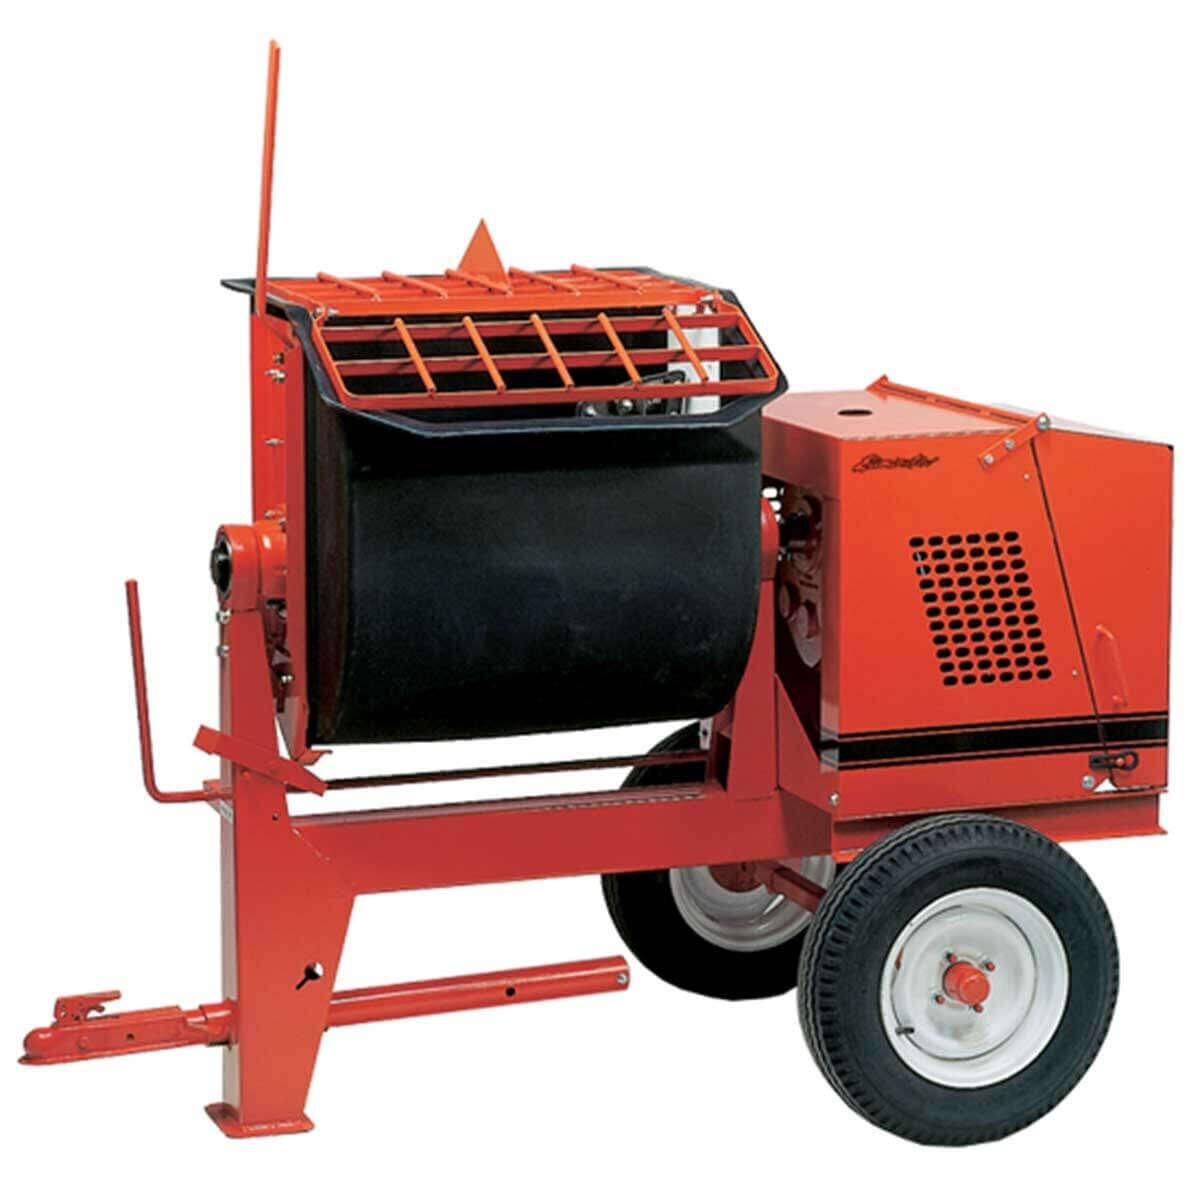 Towable Mortar Mixer